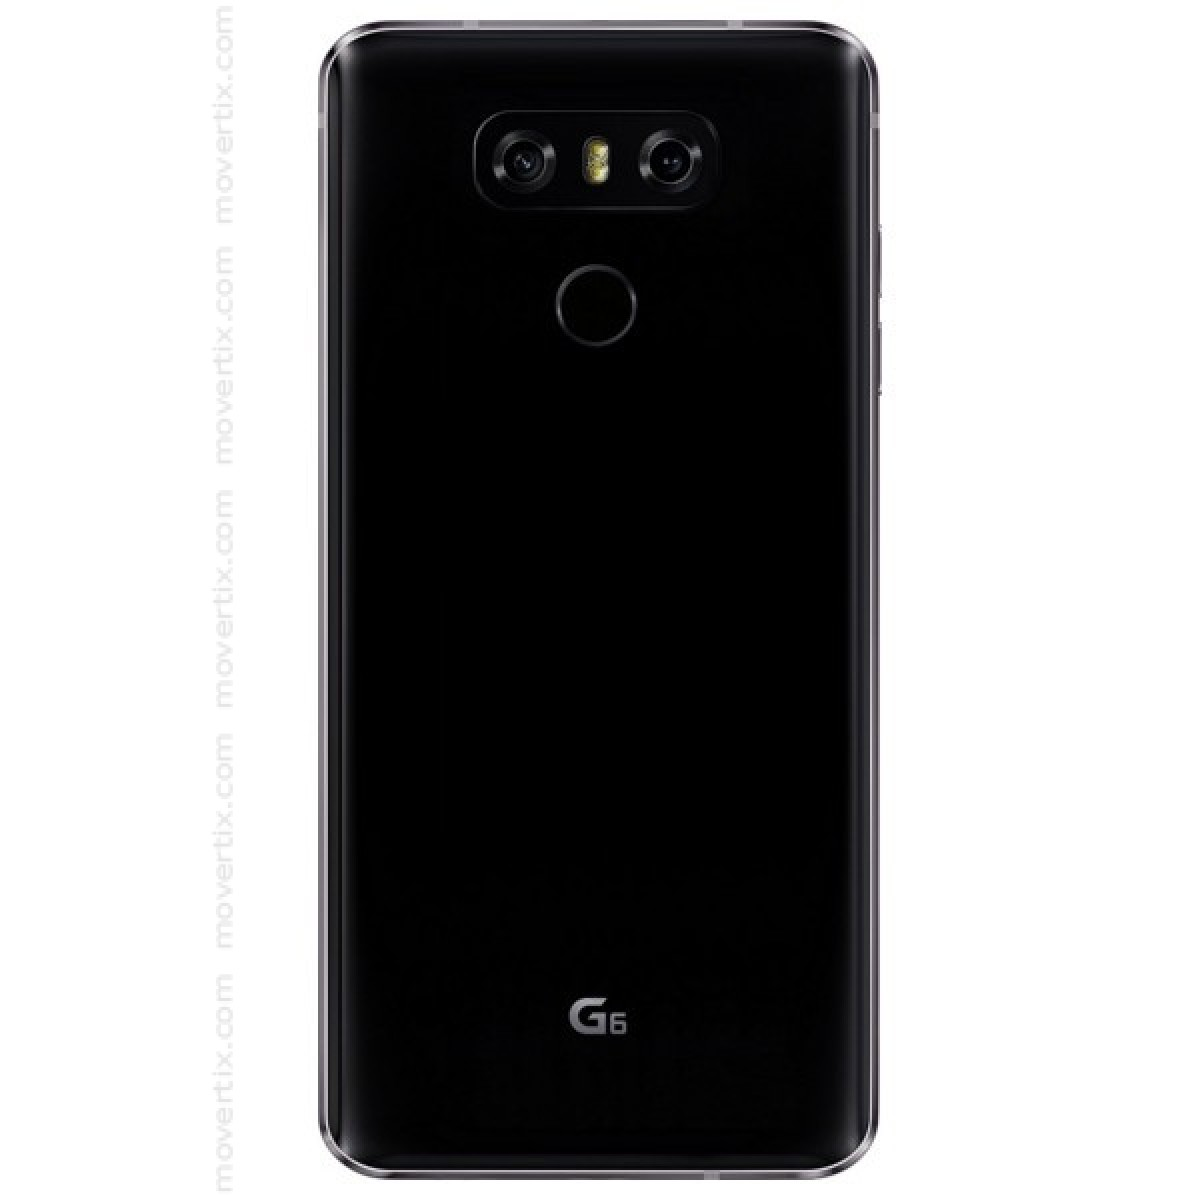 LG G6 en Negro (H870)